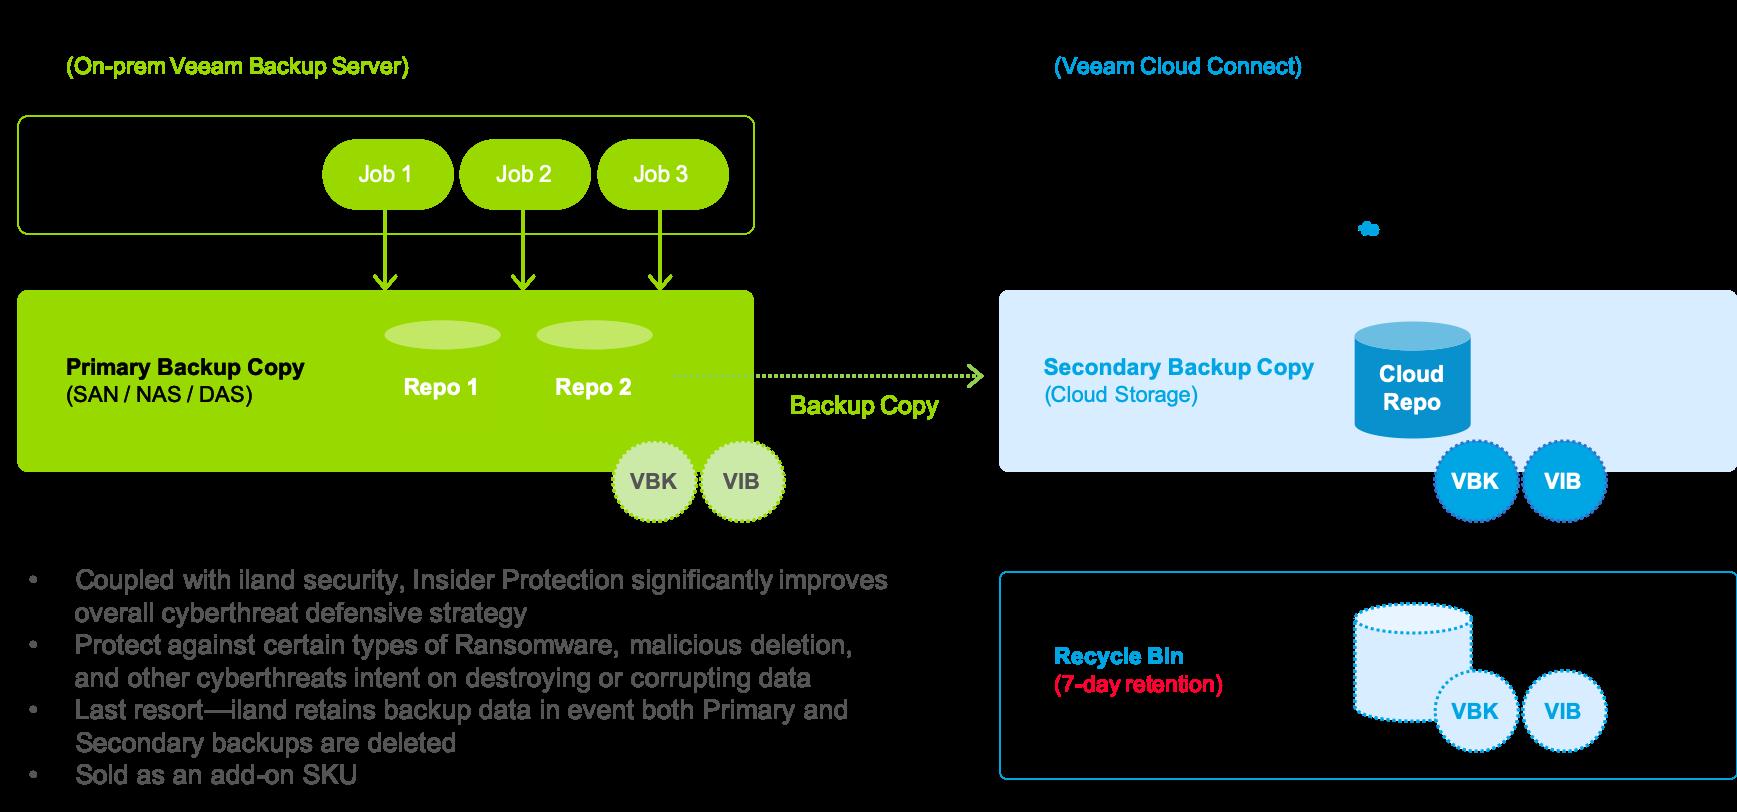 iland Secure Cloud Backup - Veeam Cloud Connect Backup